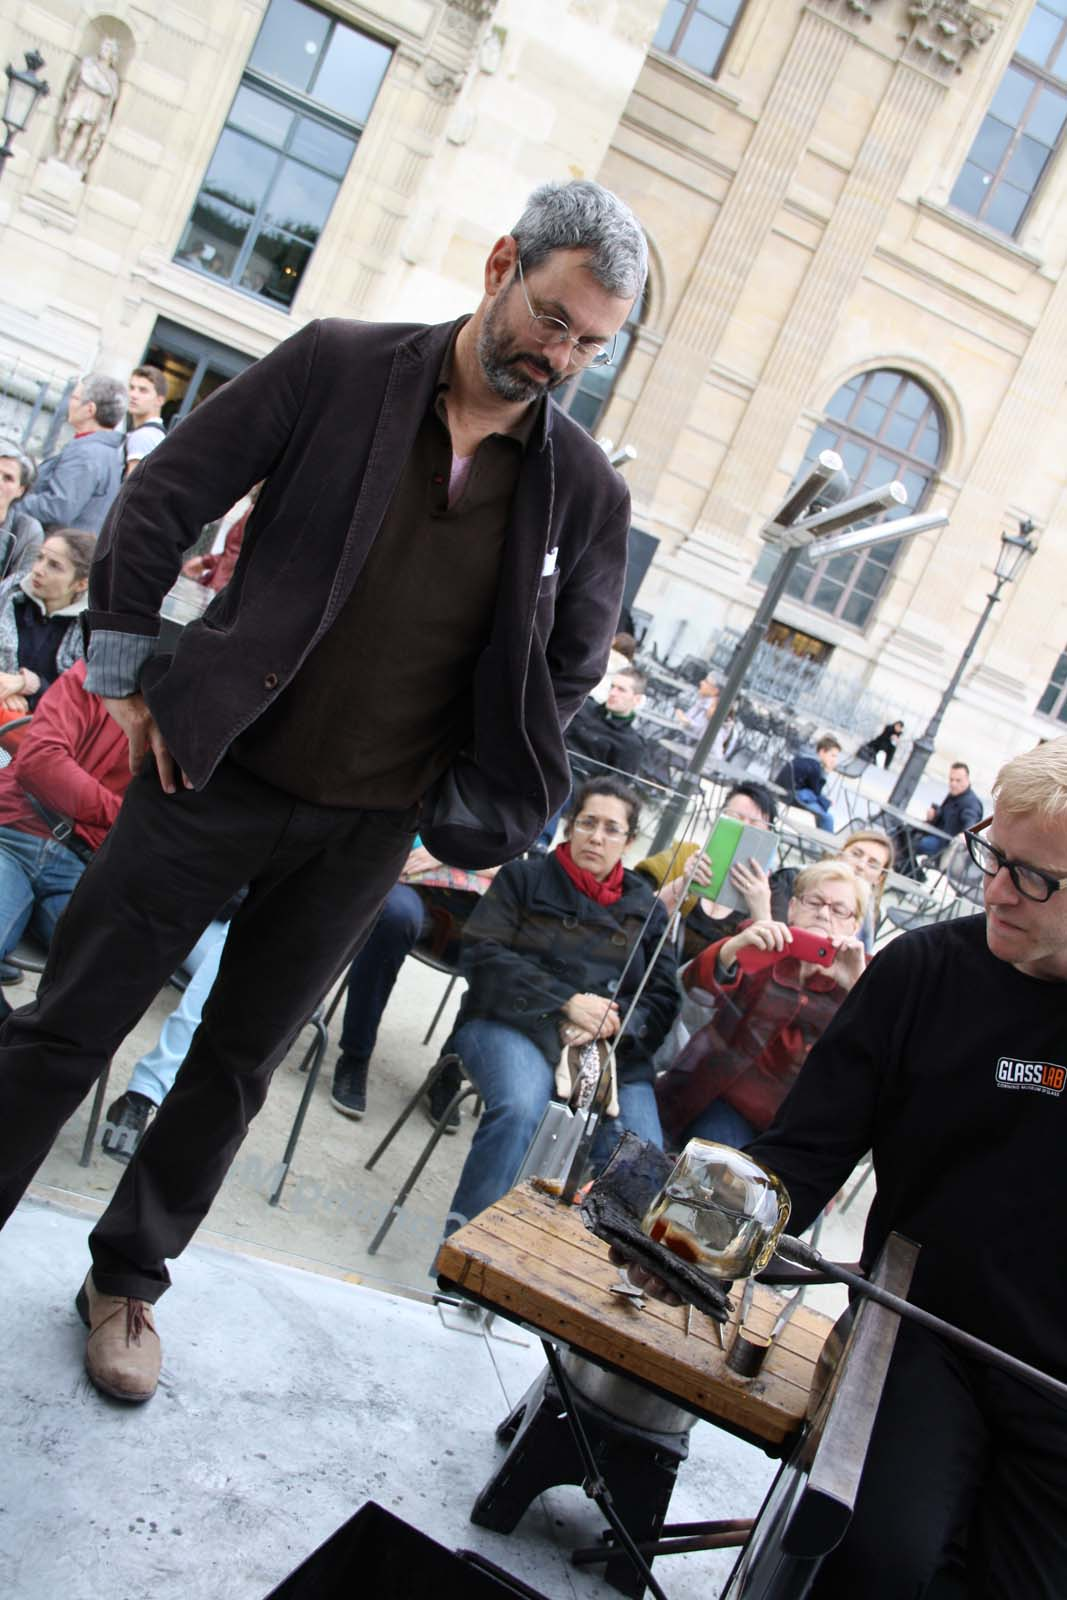 Designer Didier Tisseyre in a GlassLab design session in Paris, 2013.